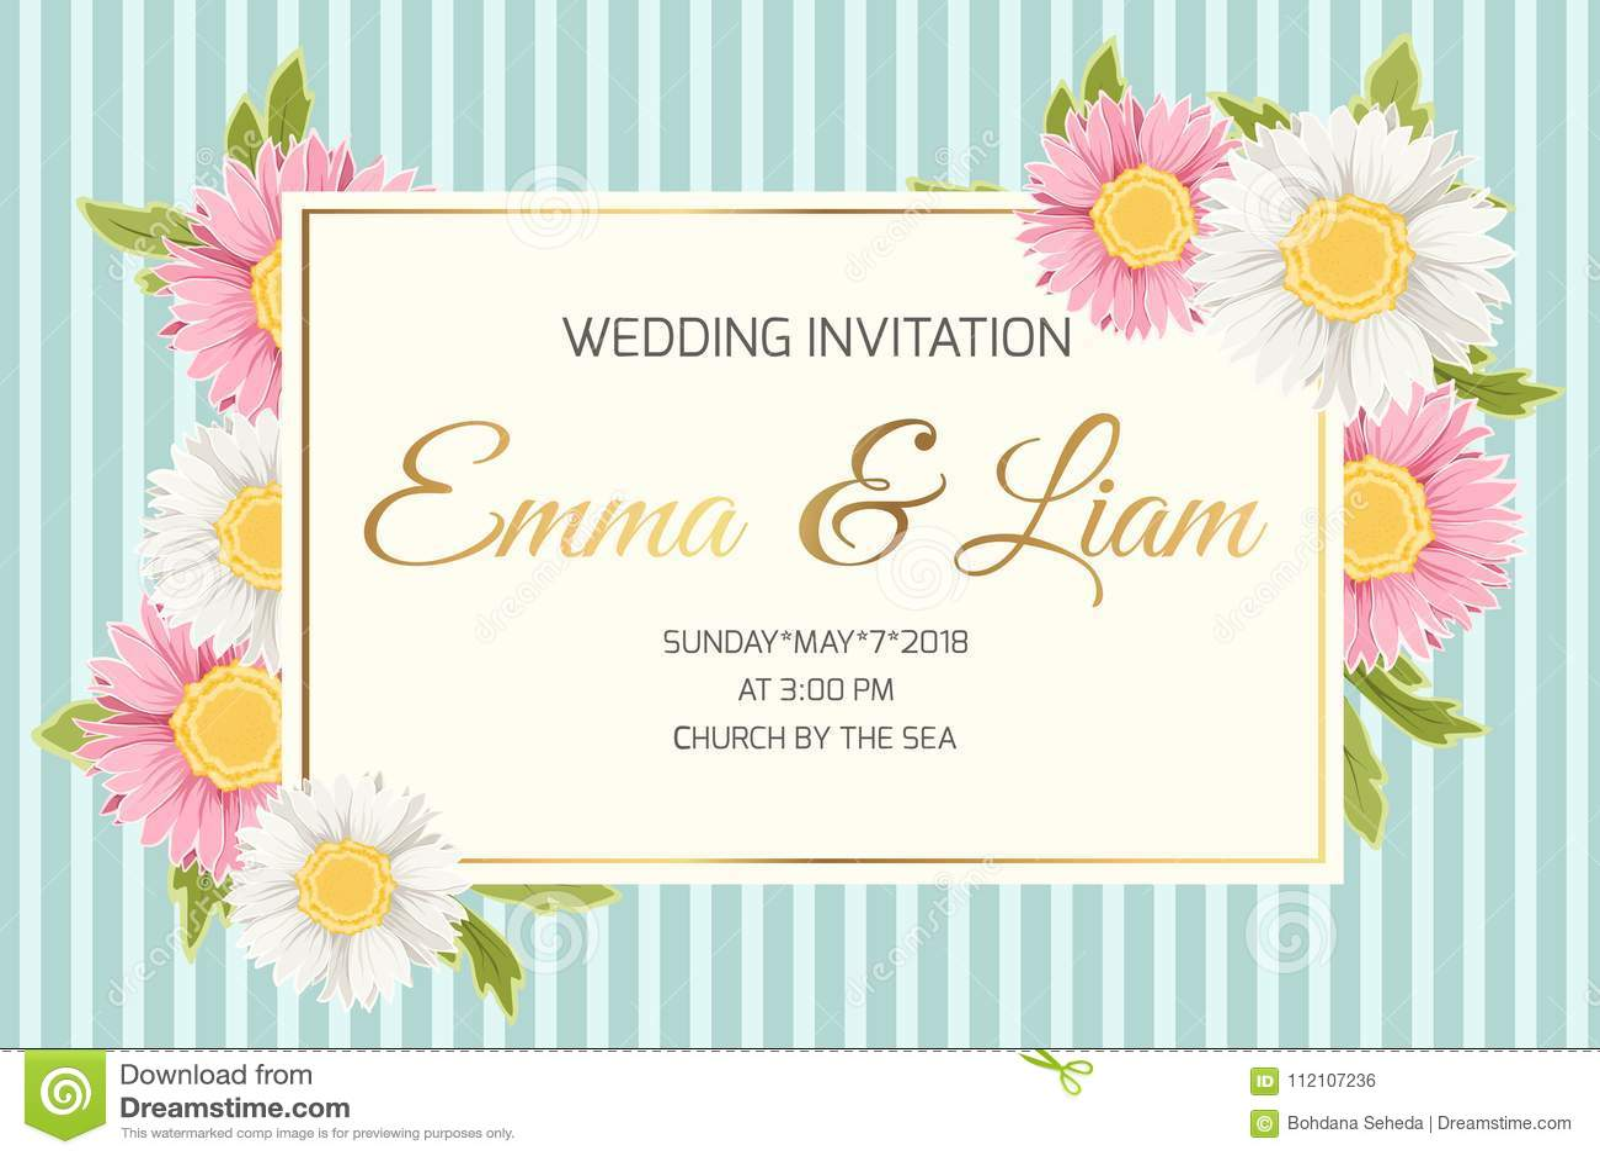 Wedding Invitation Daisy Aster Chamomile Flowers Stock Vector